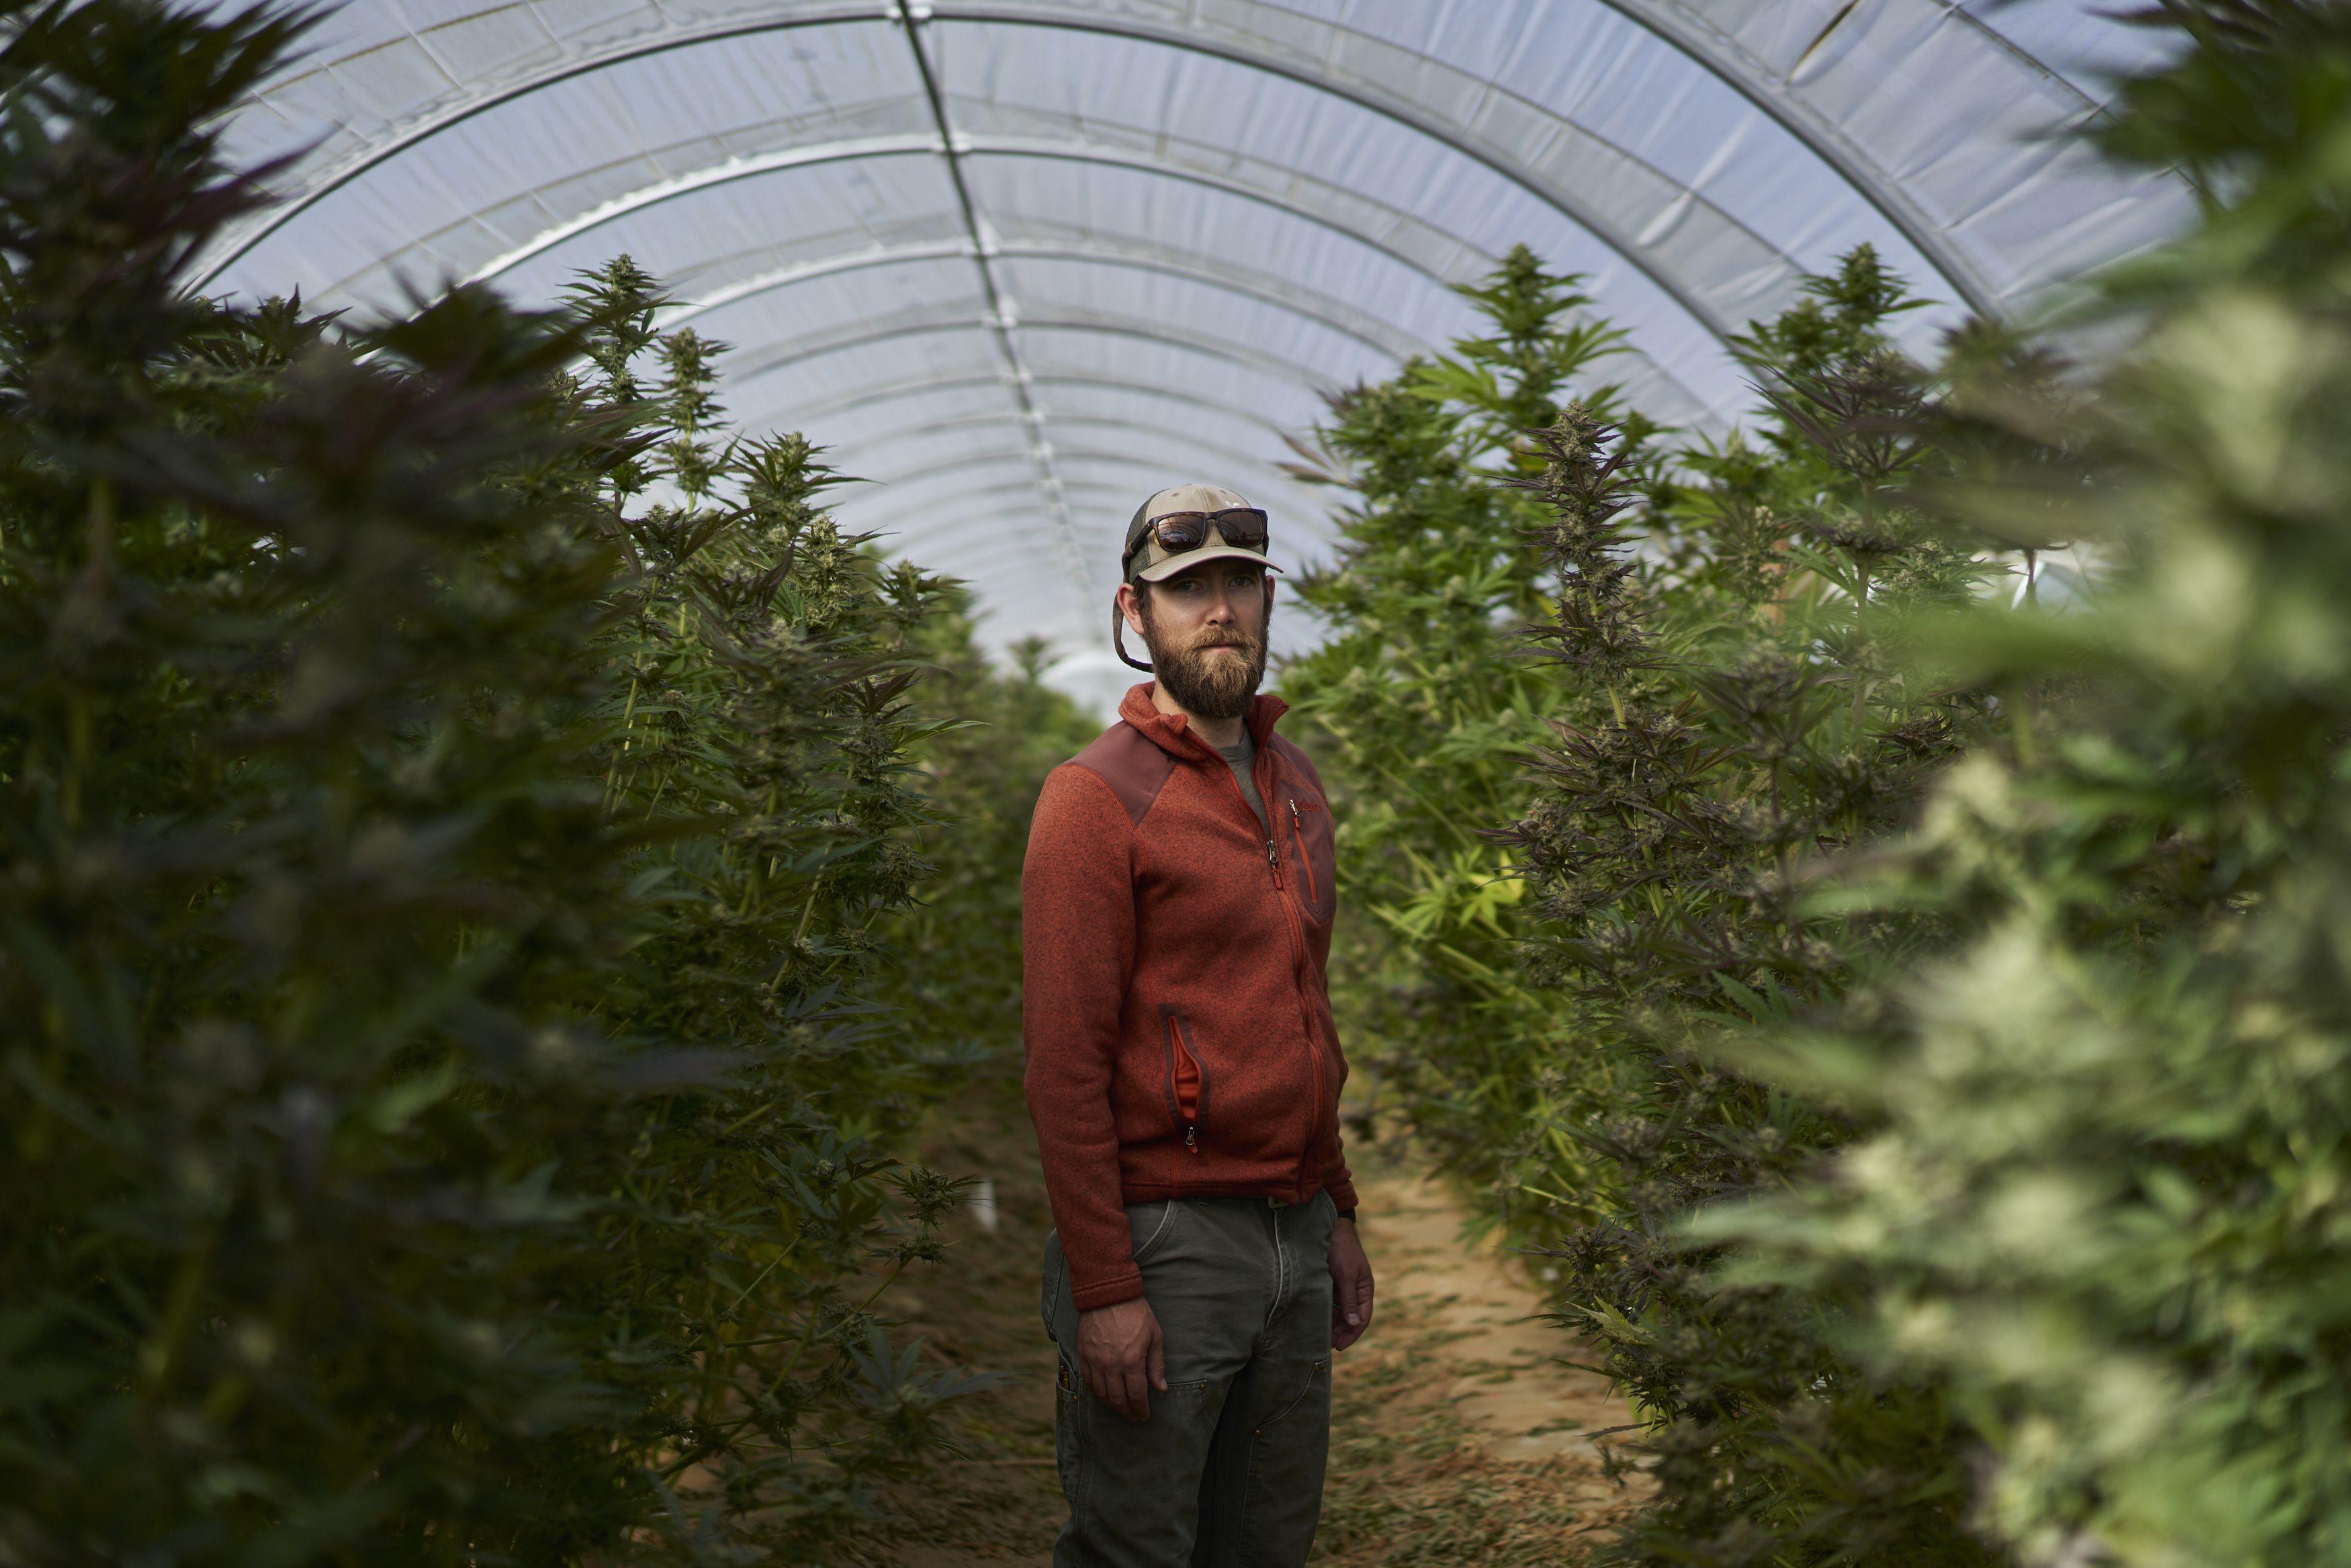 Marijuana is emerging among California's vineyards, offering